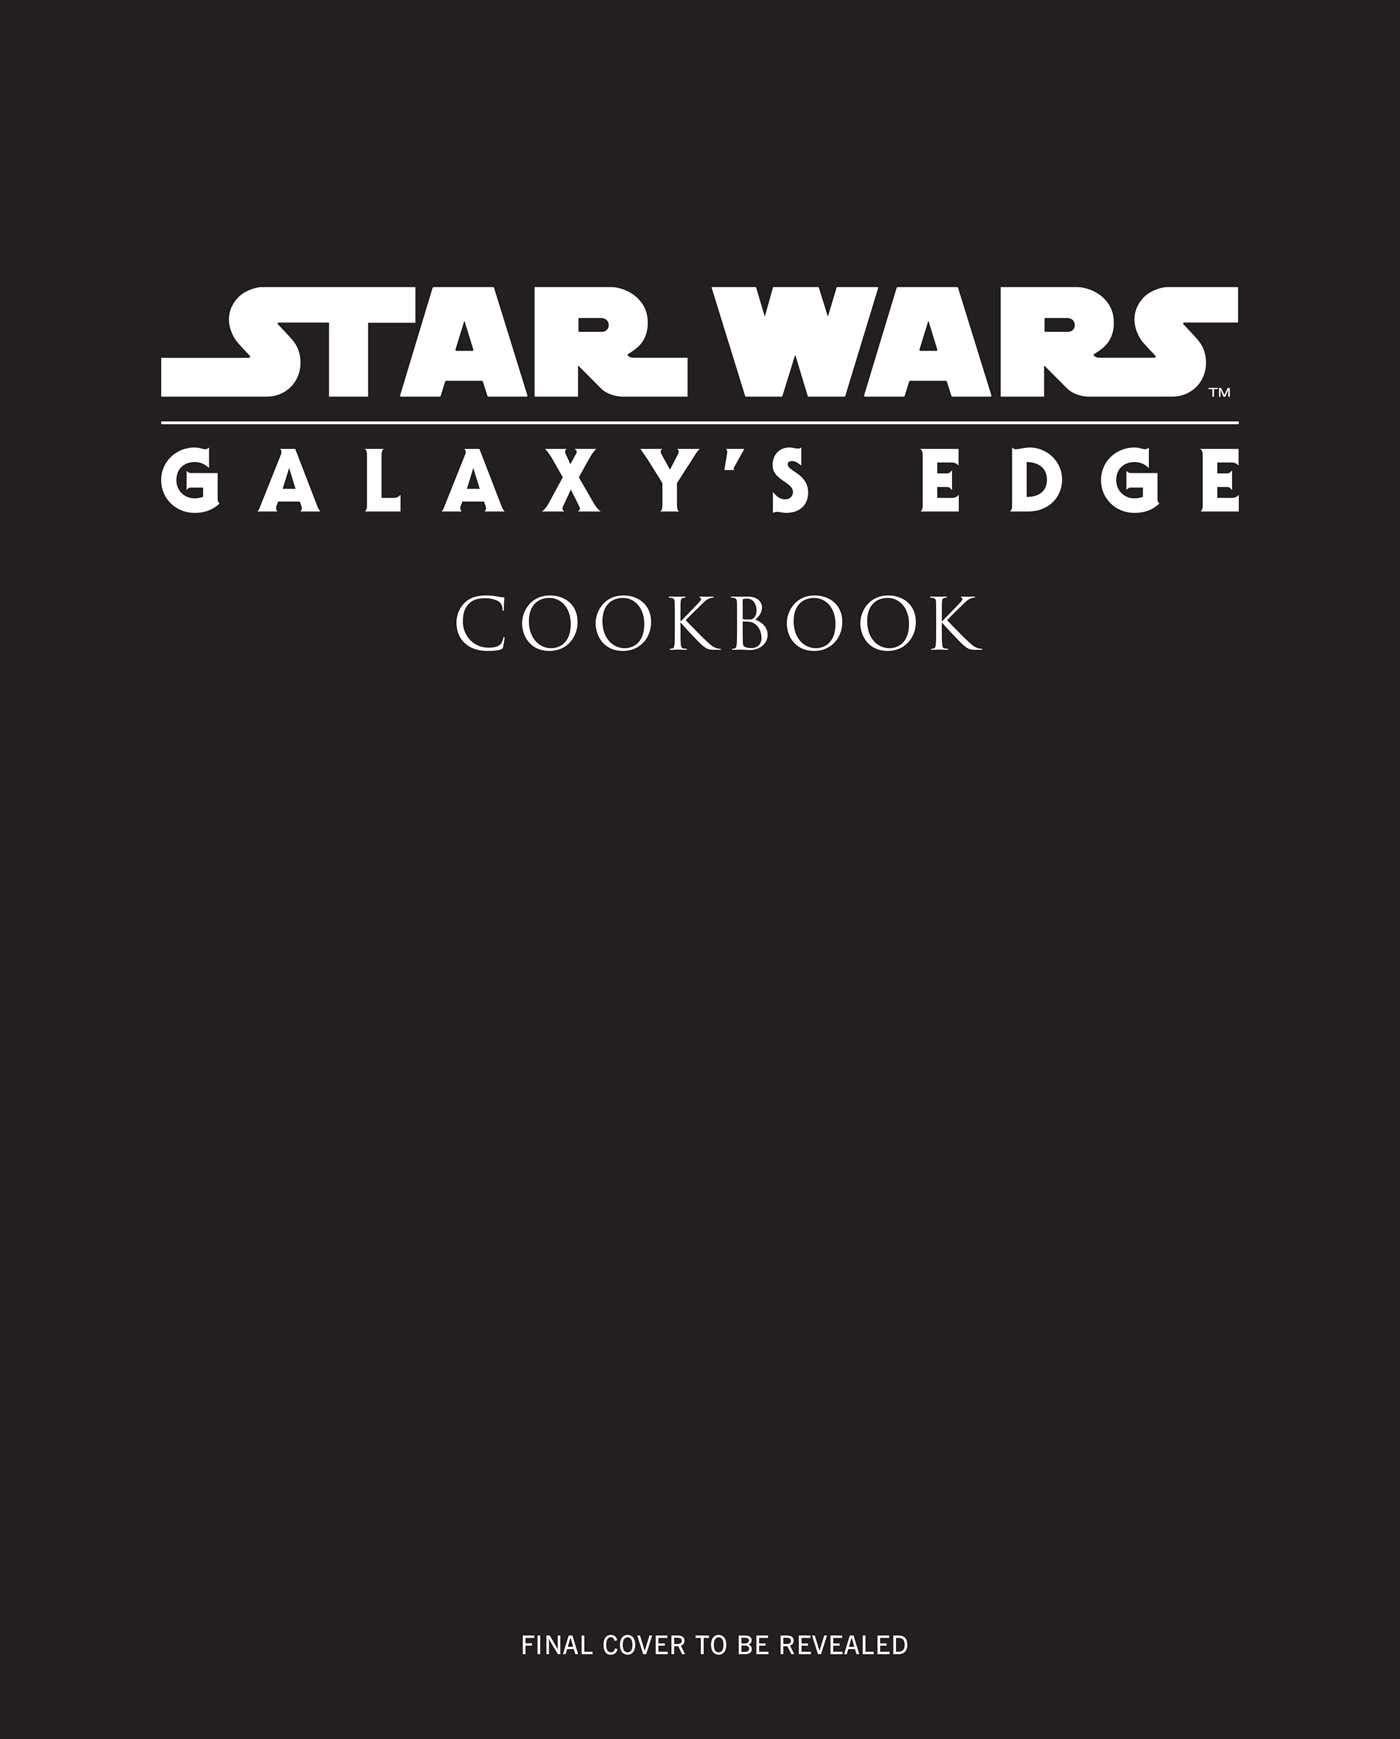 a434a5f170eef Amazon.com: Star Wars: Galaxy's Edge Cookbook (9781683837985 ...